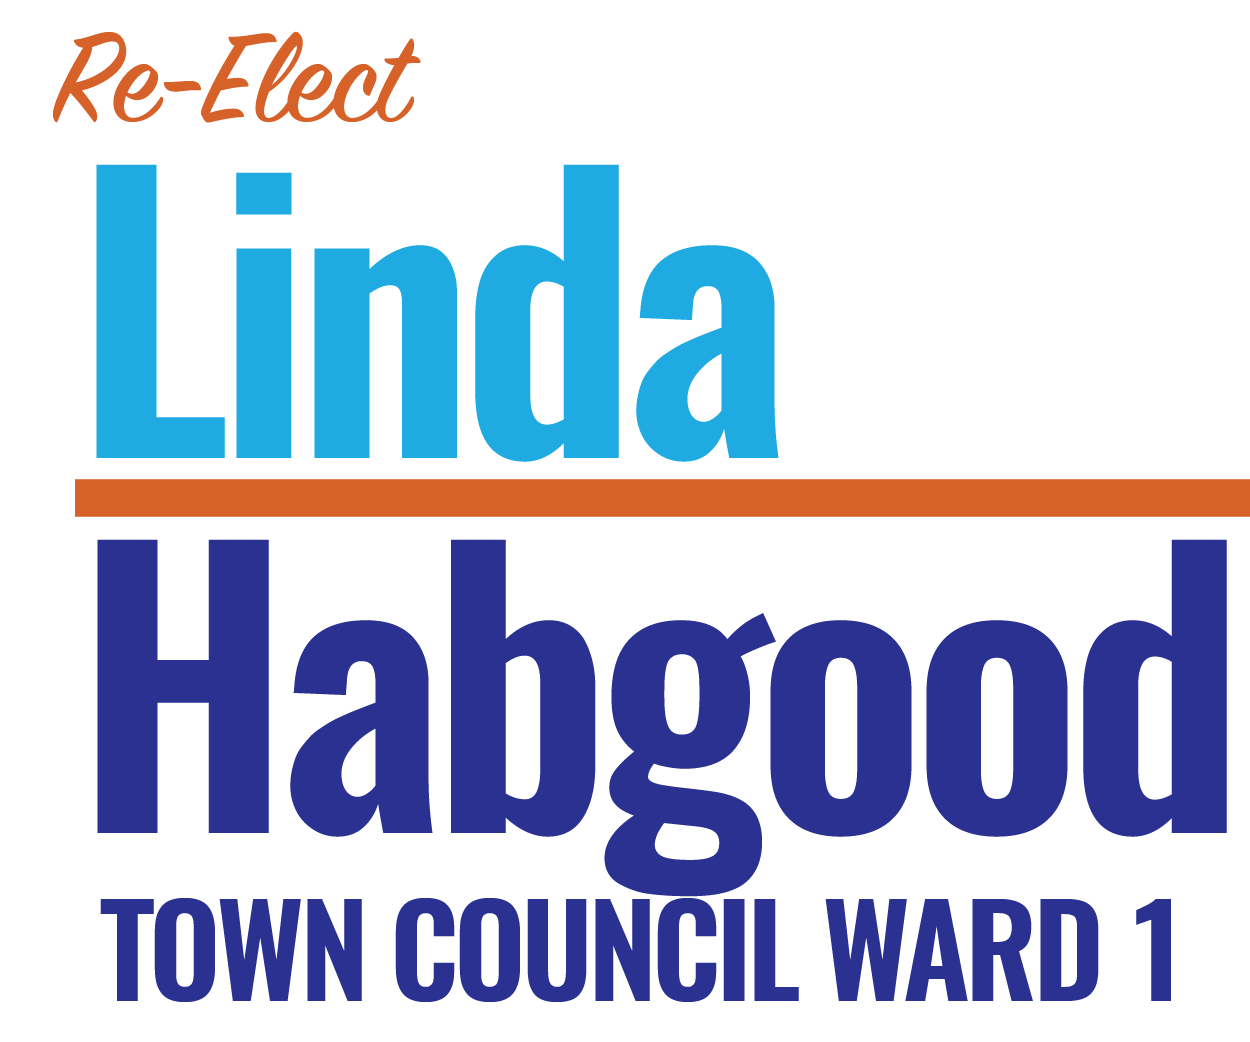 Re-elect Councilwoman Linda Habgood for Ward 1